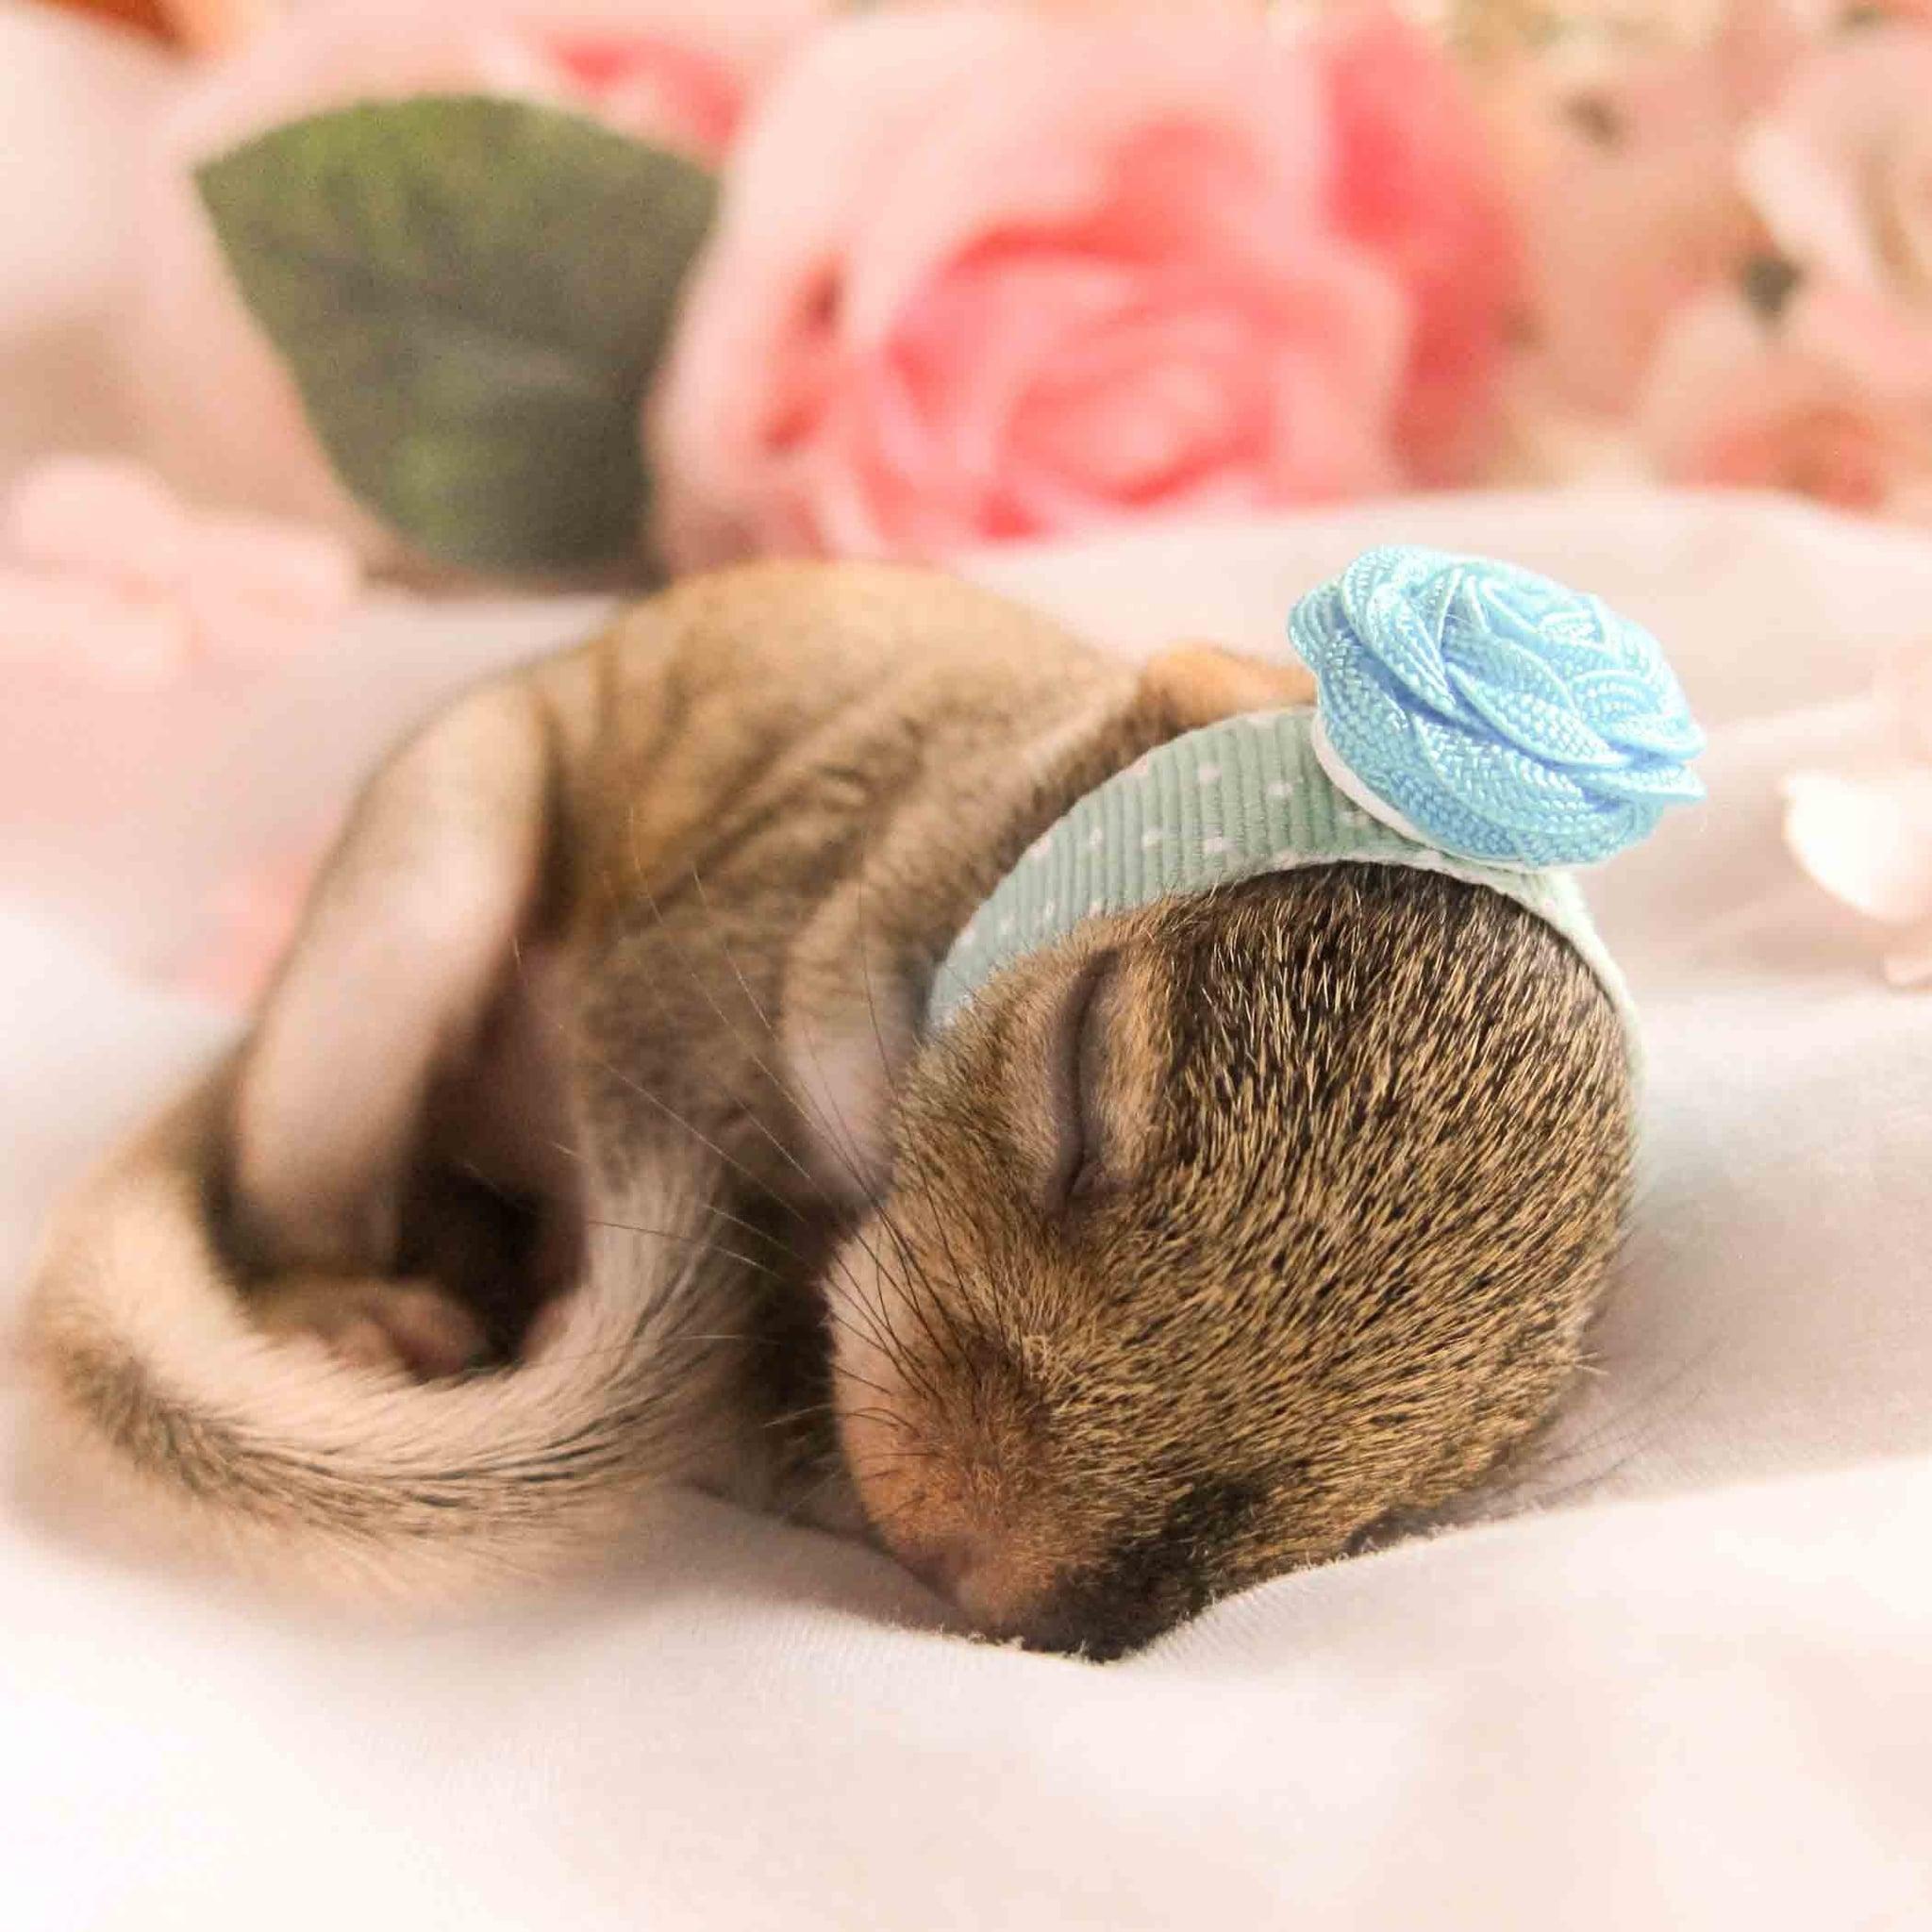 Newborn Squirrel Photo Shoot Popsugar Family